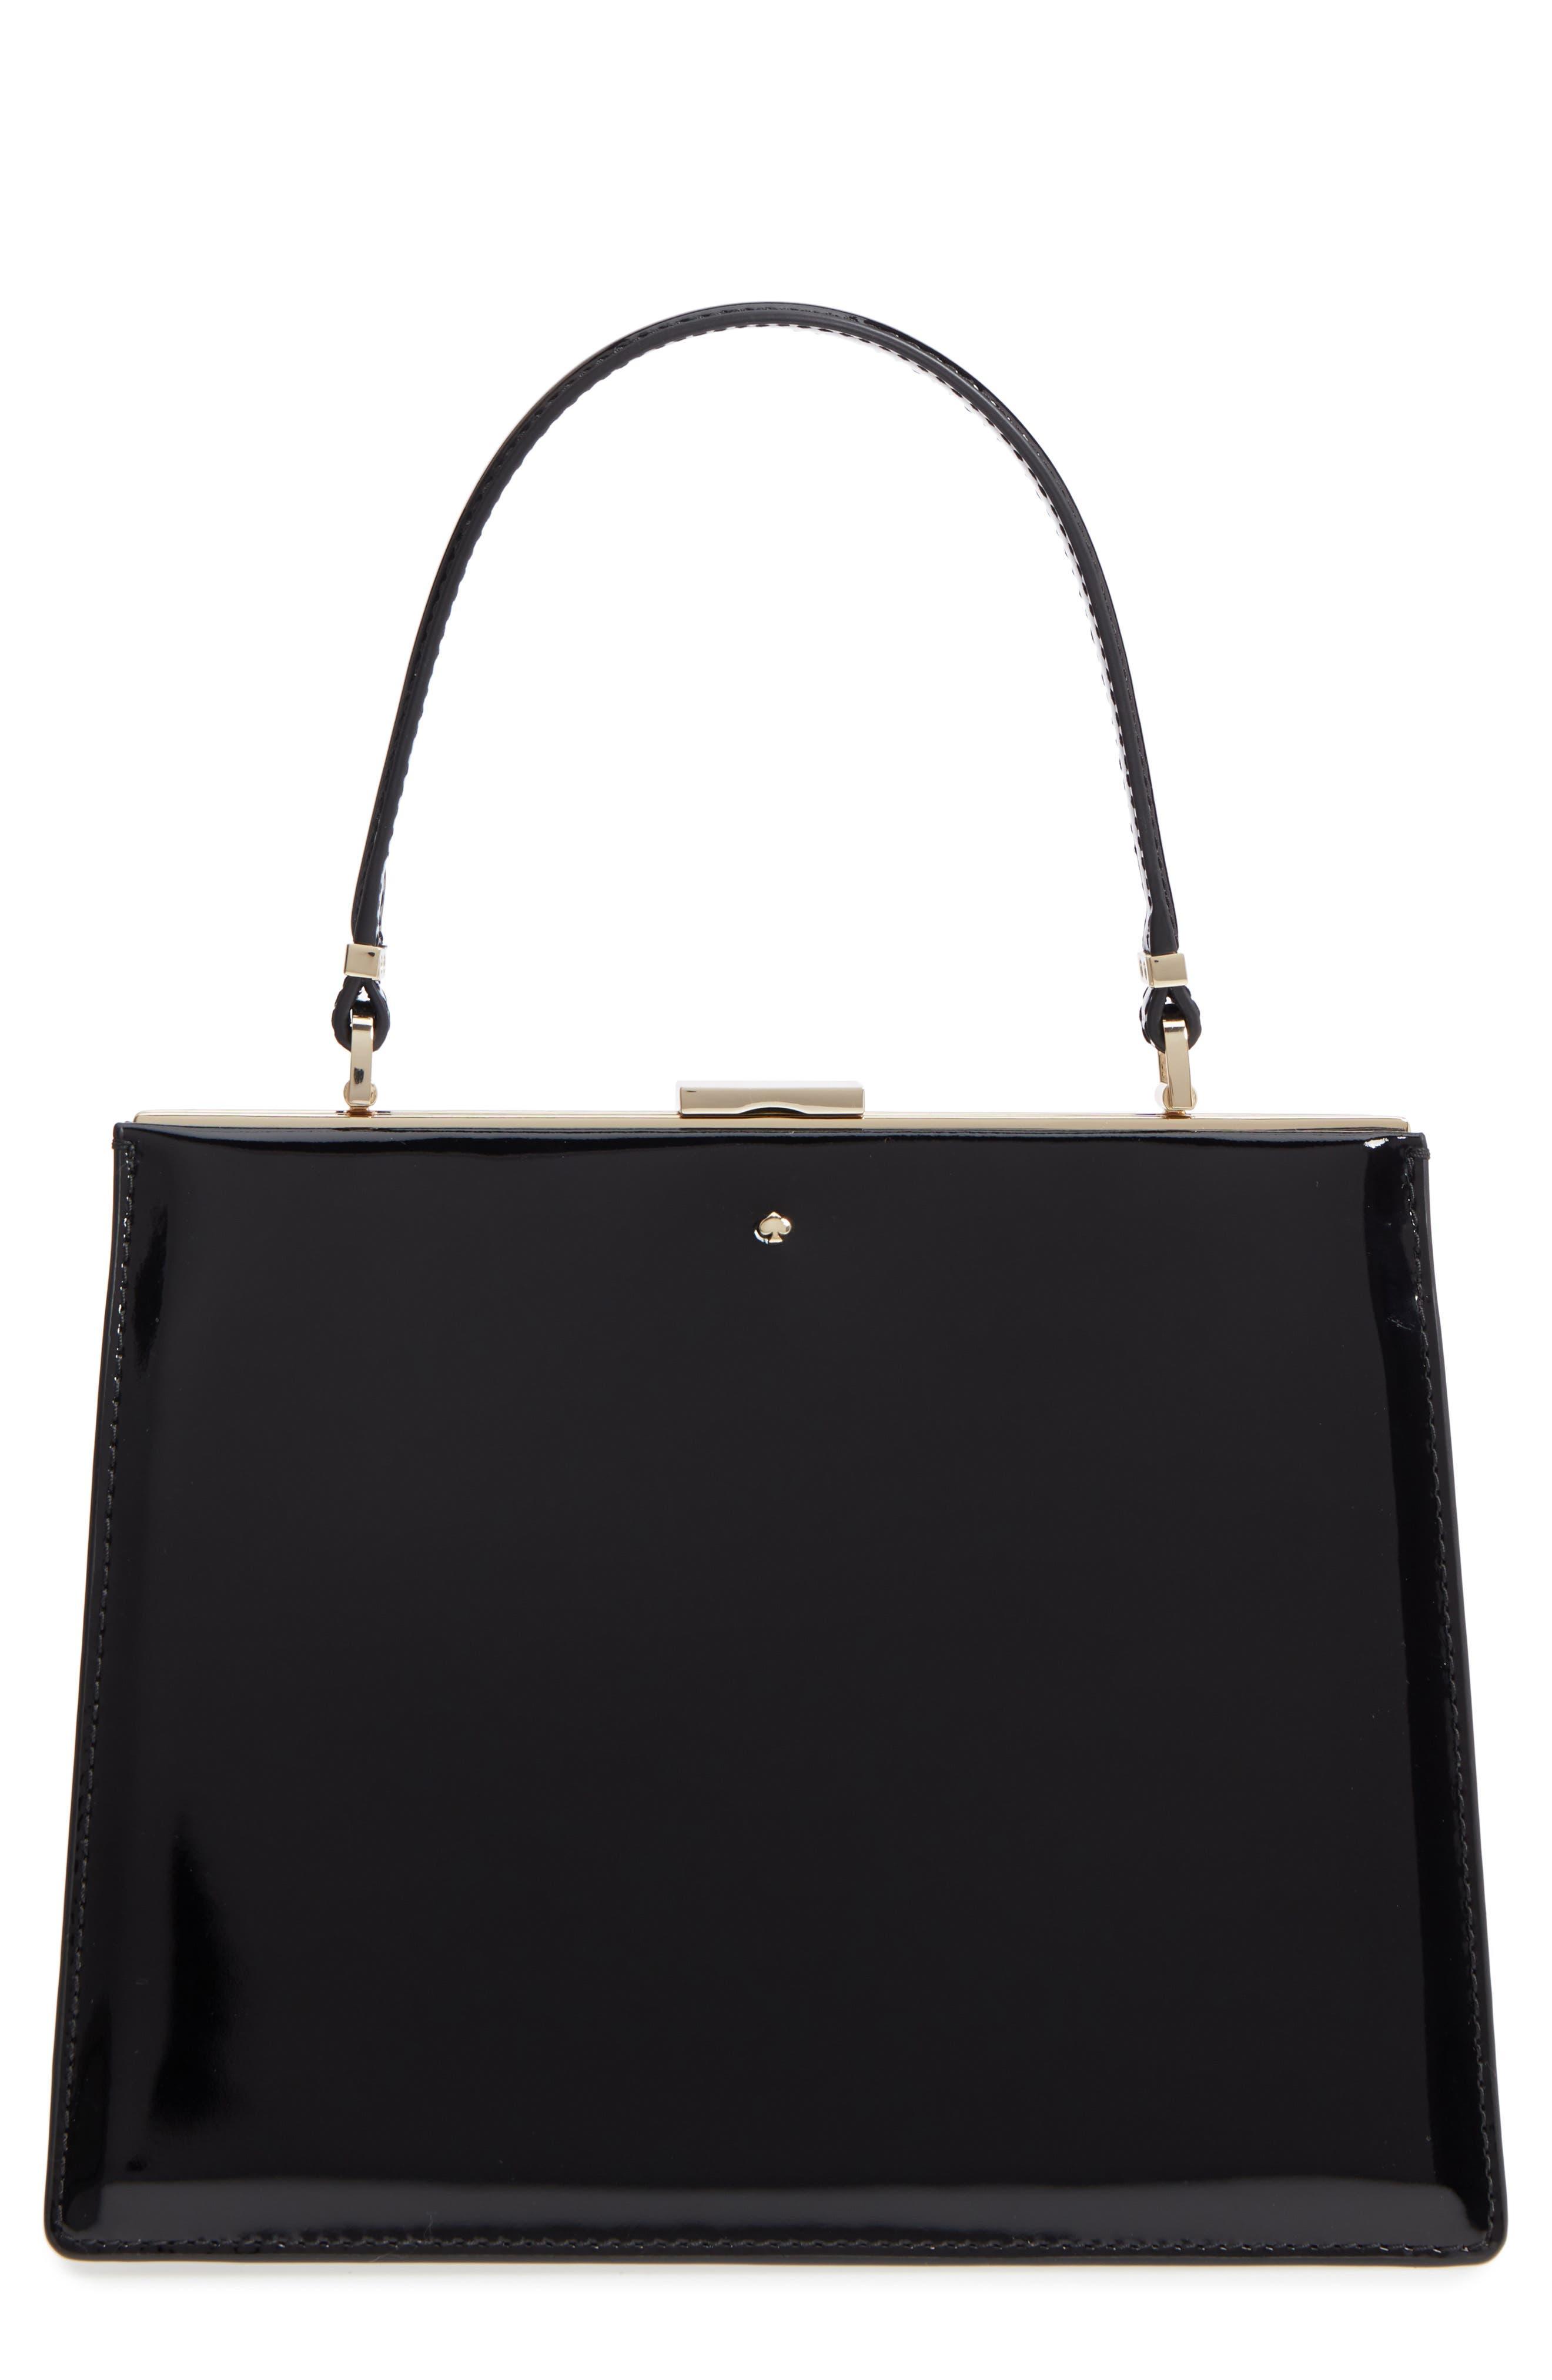 KATE SPADE NEW YORK,                             madison moore road - chari leather handbag,                             Main thumbnail 1, color,                             001